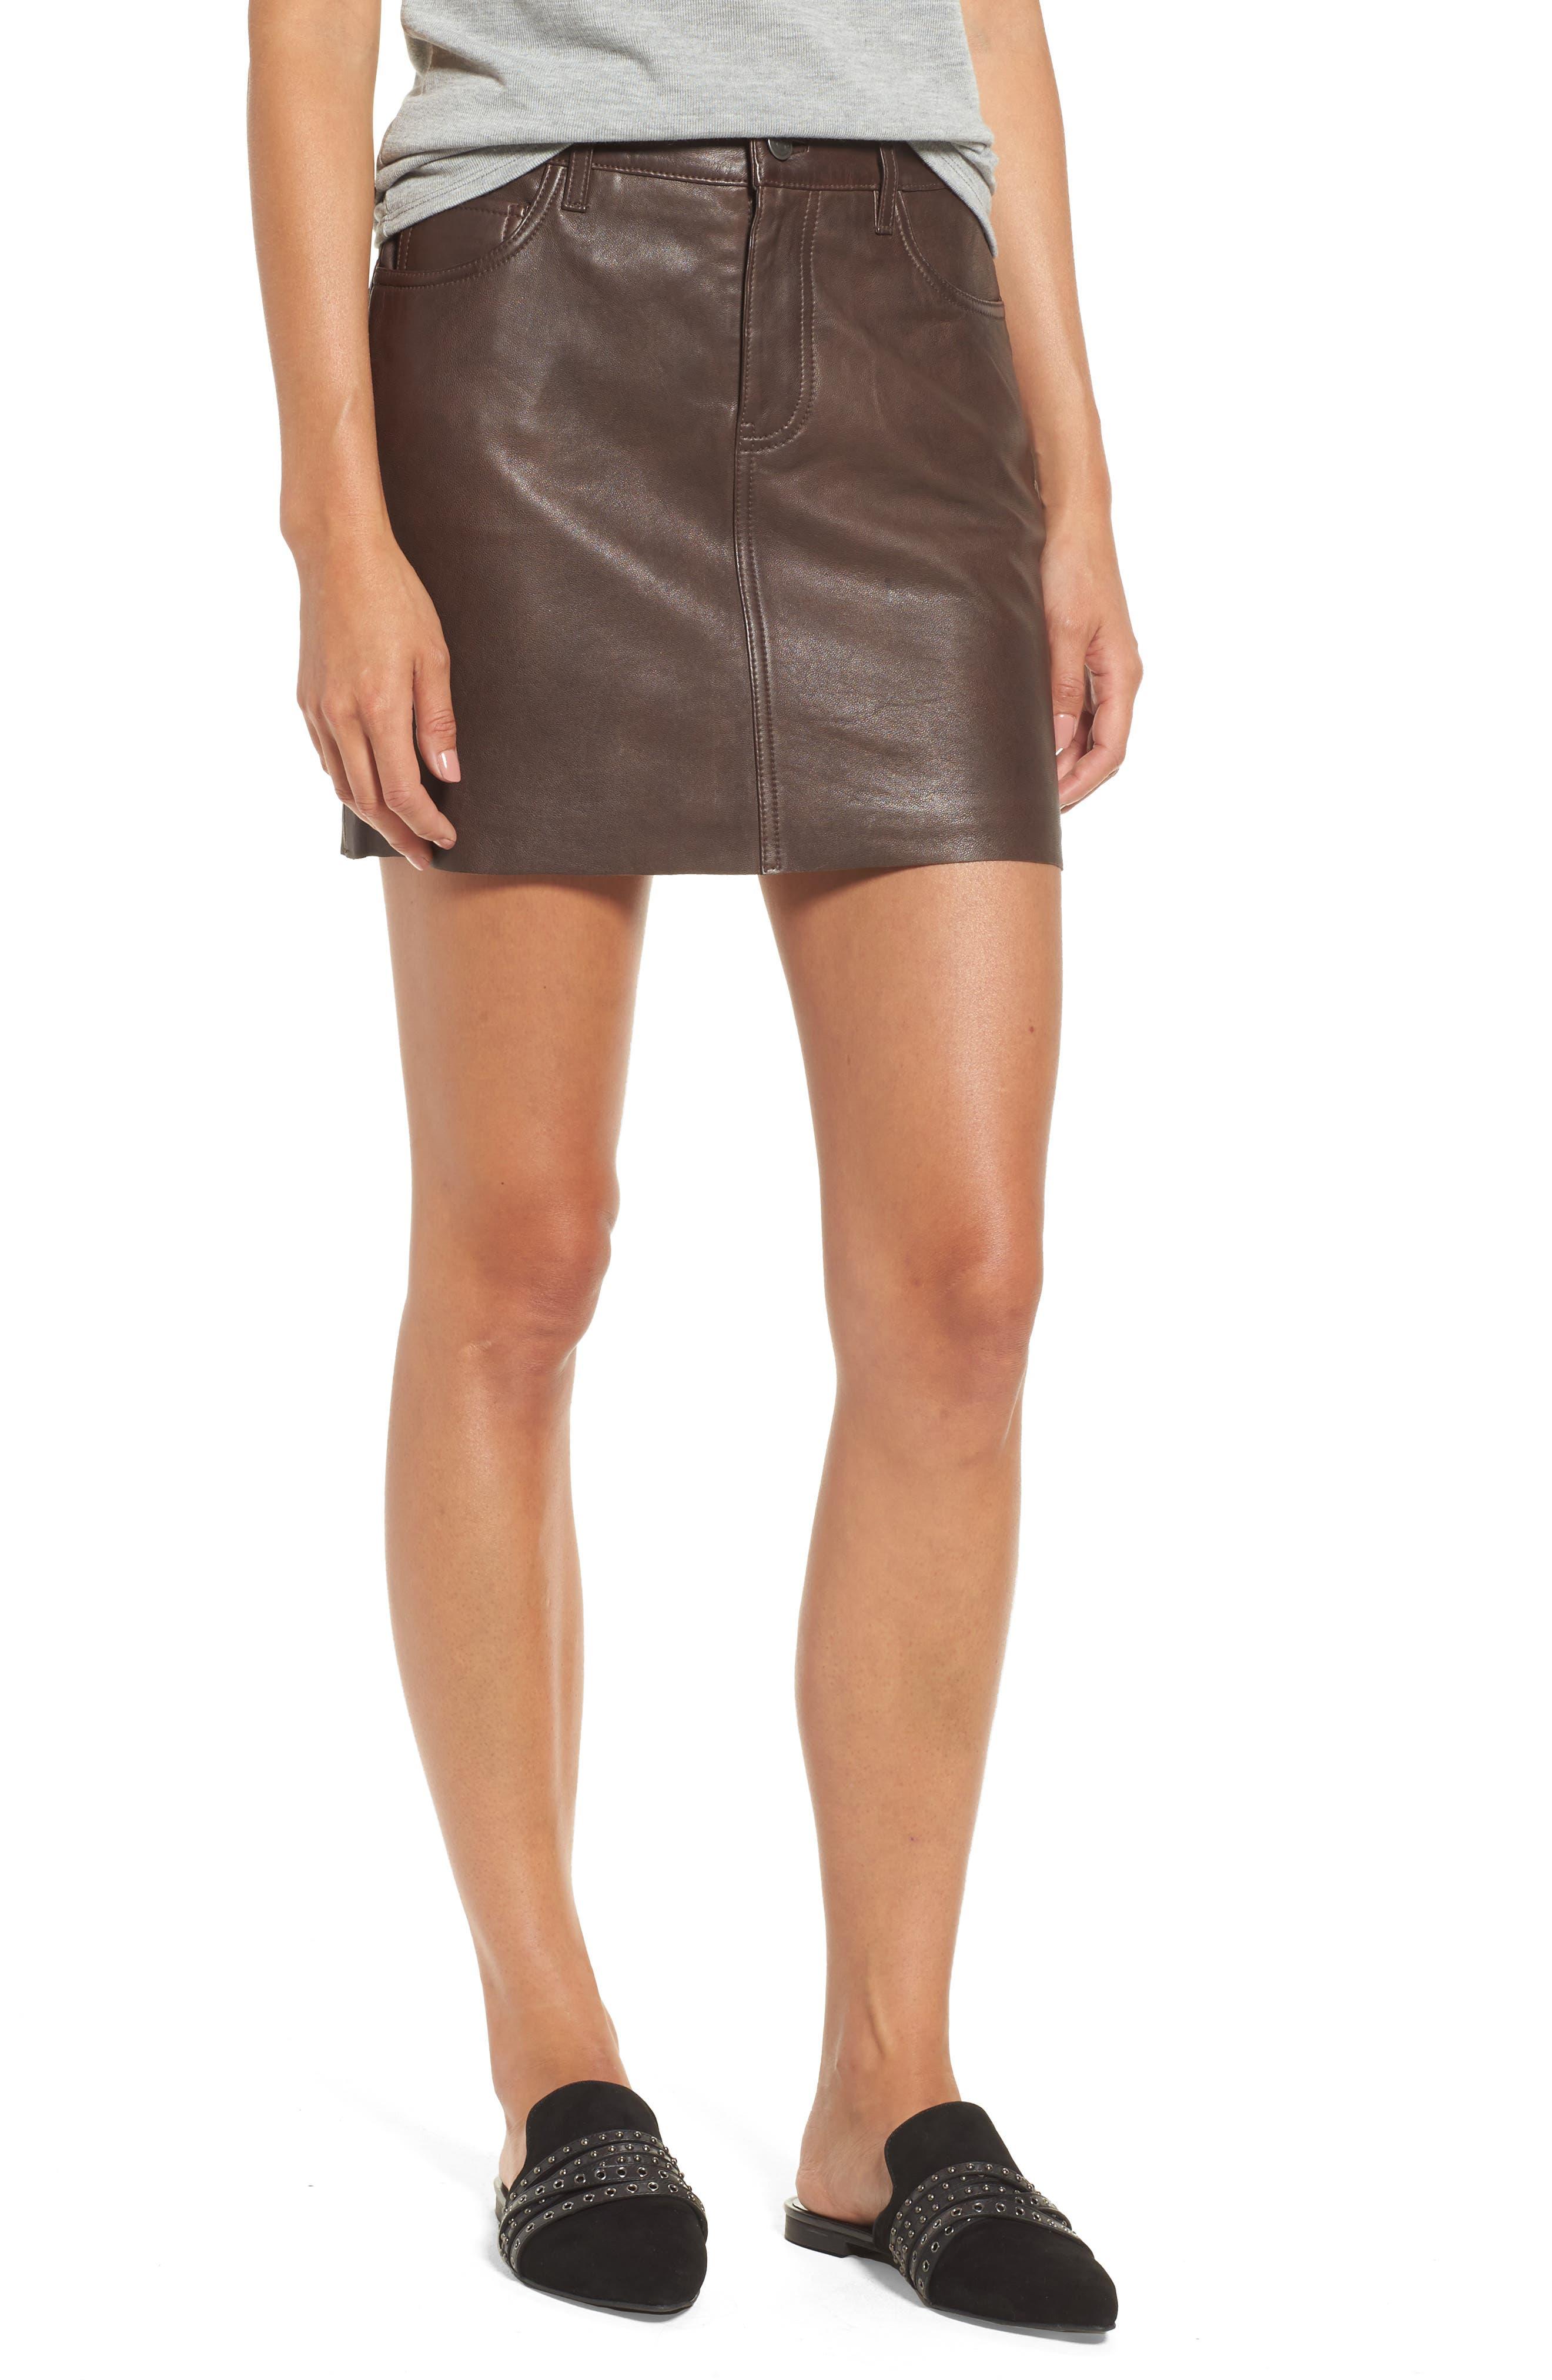 Treasure & Bond x Something Navy Leather Miniskirt